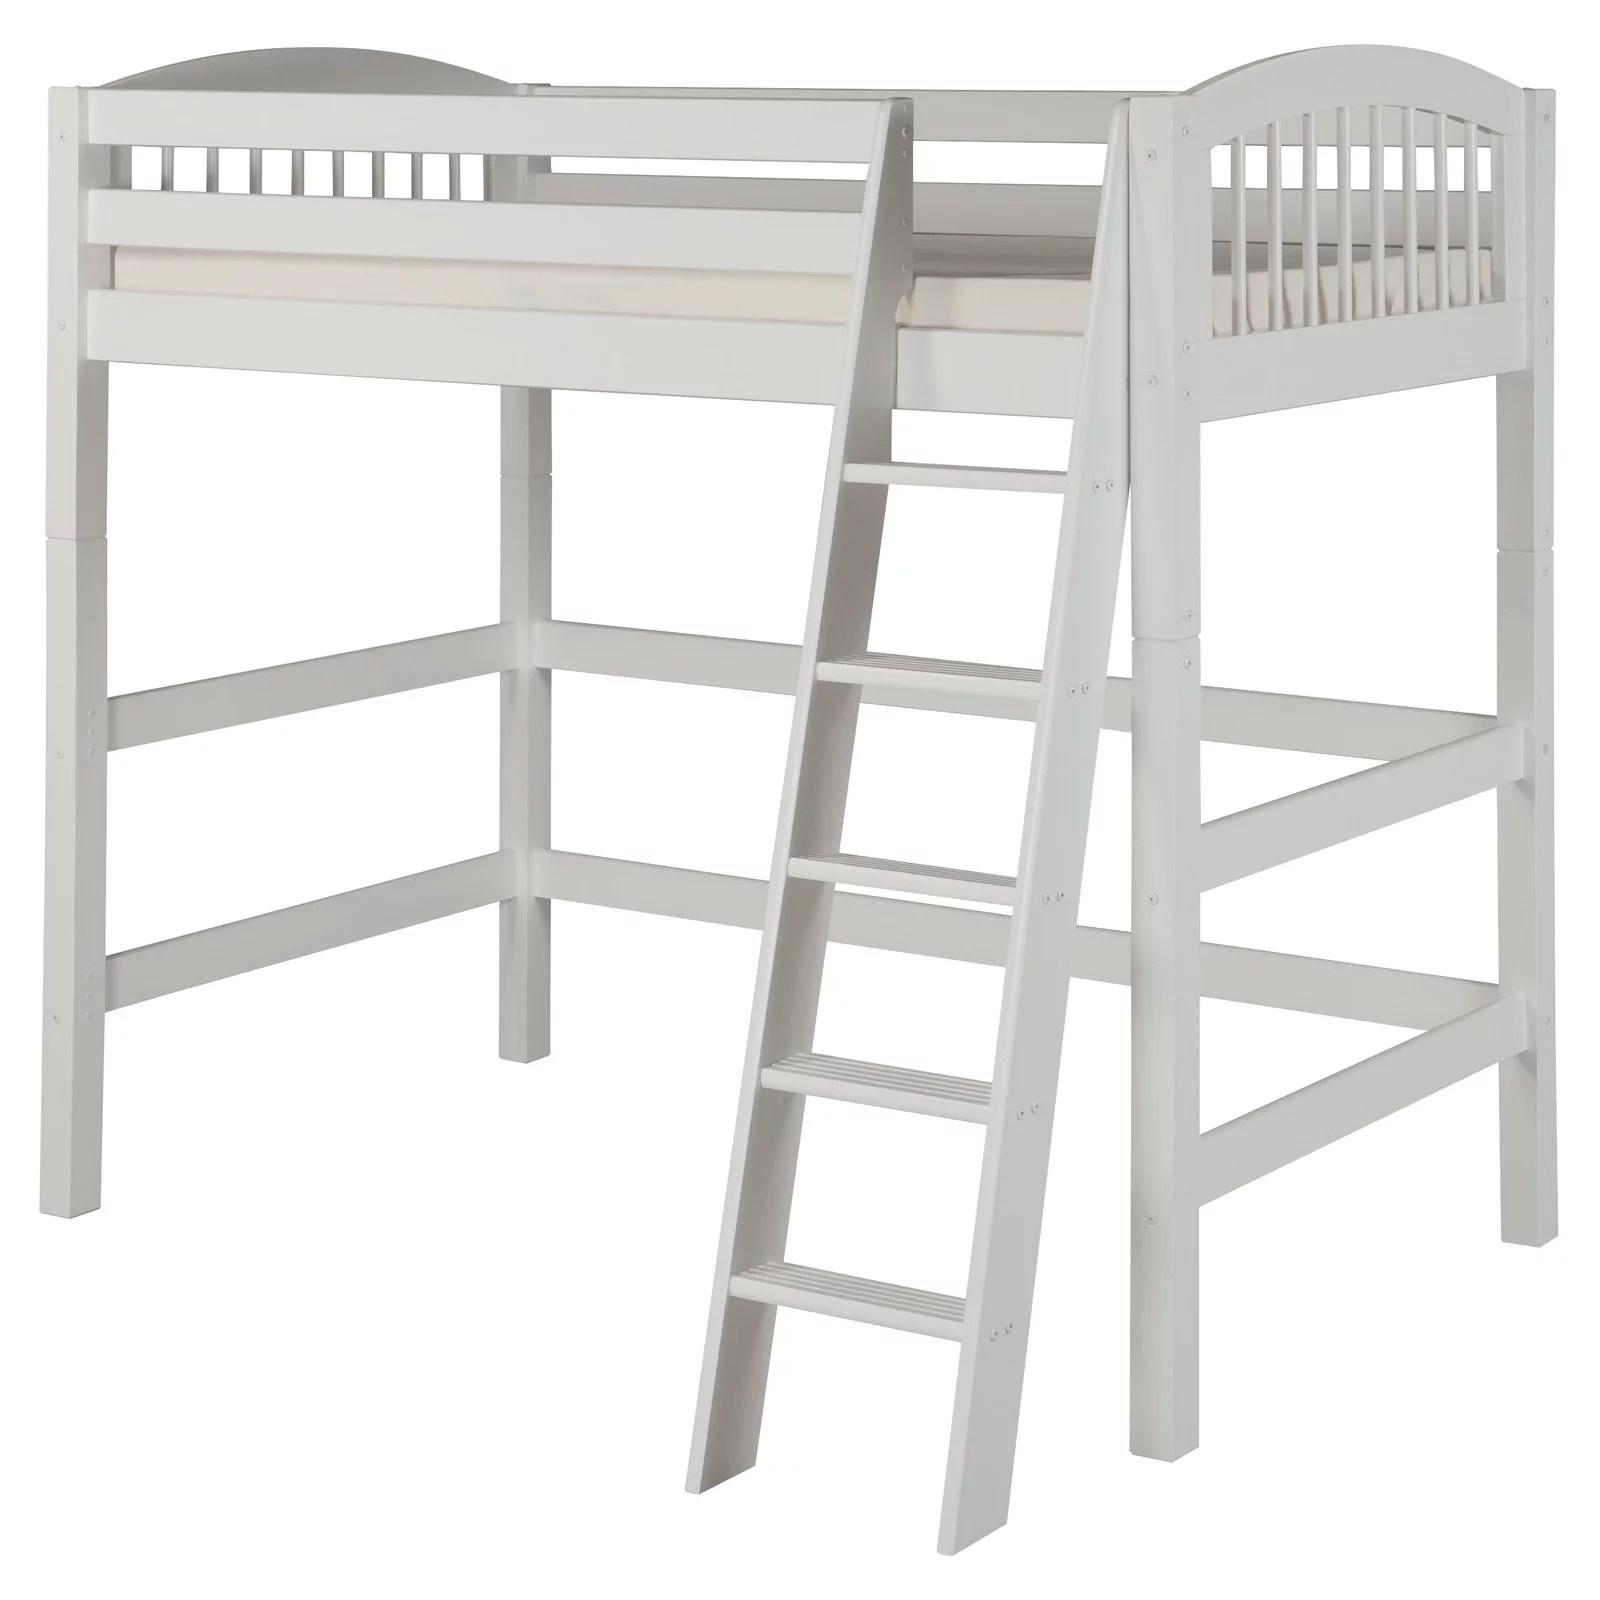 Camaflexi Twin Size High Loft Bed Arch Spindle Headboard White Finish Walmart Com Walmart Com